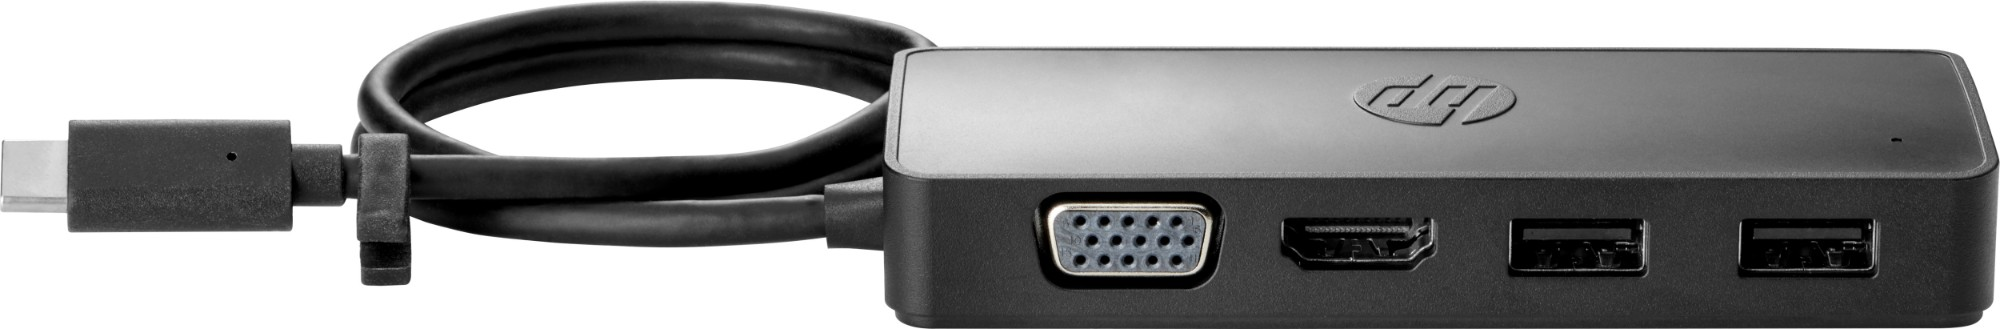 HP USB-C Travel Hub G2 USB 3.2 Gen 1 (3.1 Gen 1) Type-C